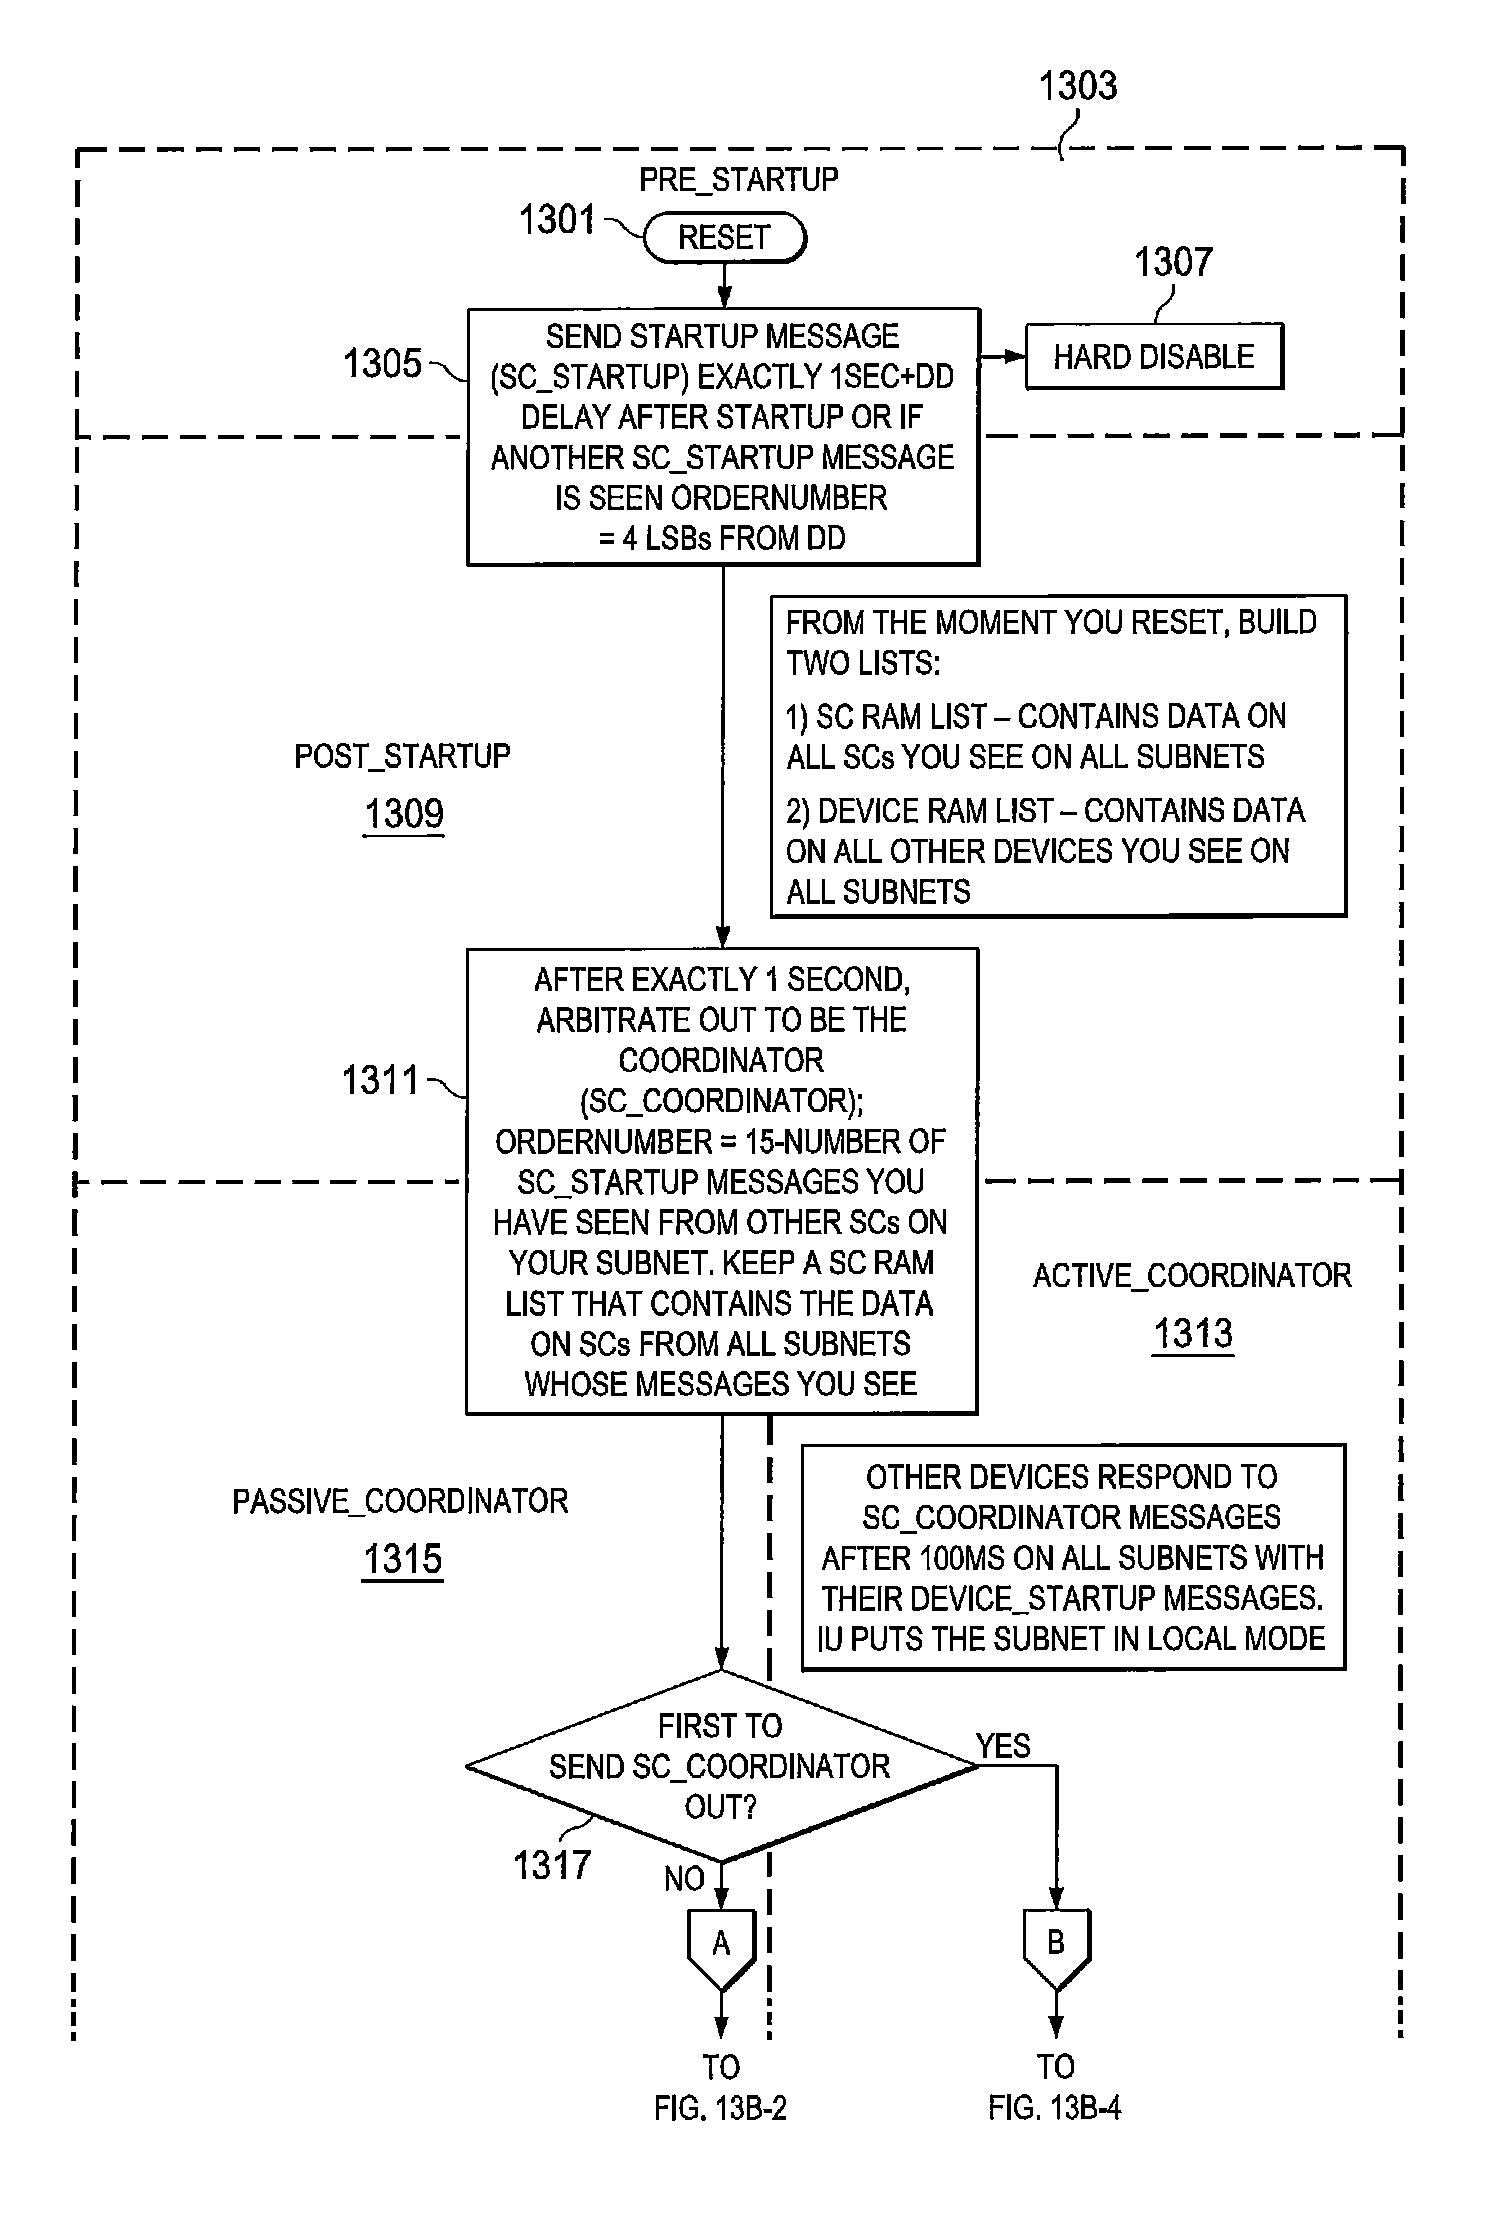 Patent US 8,874,815 B2